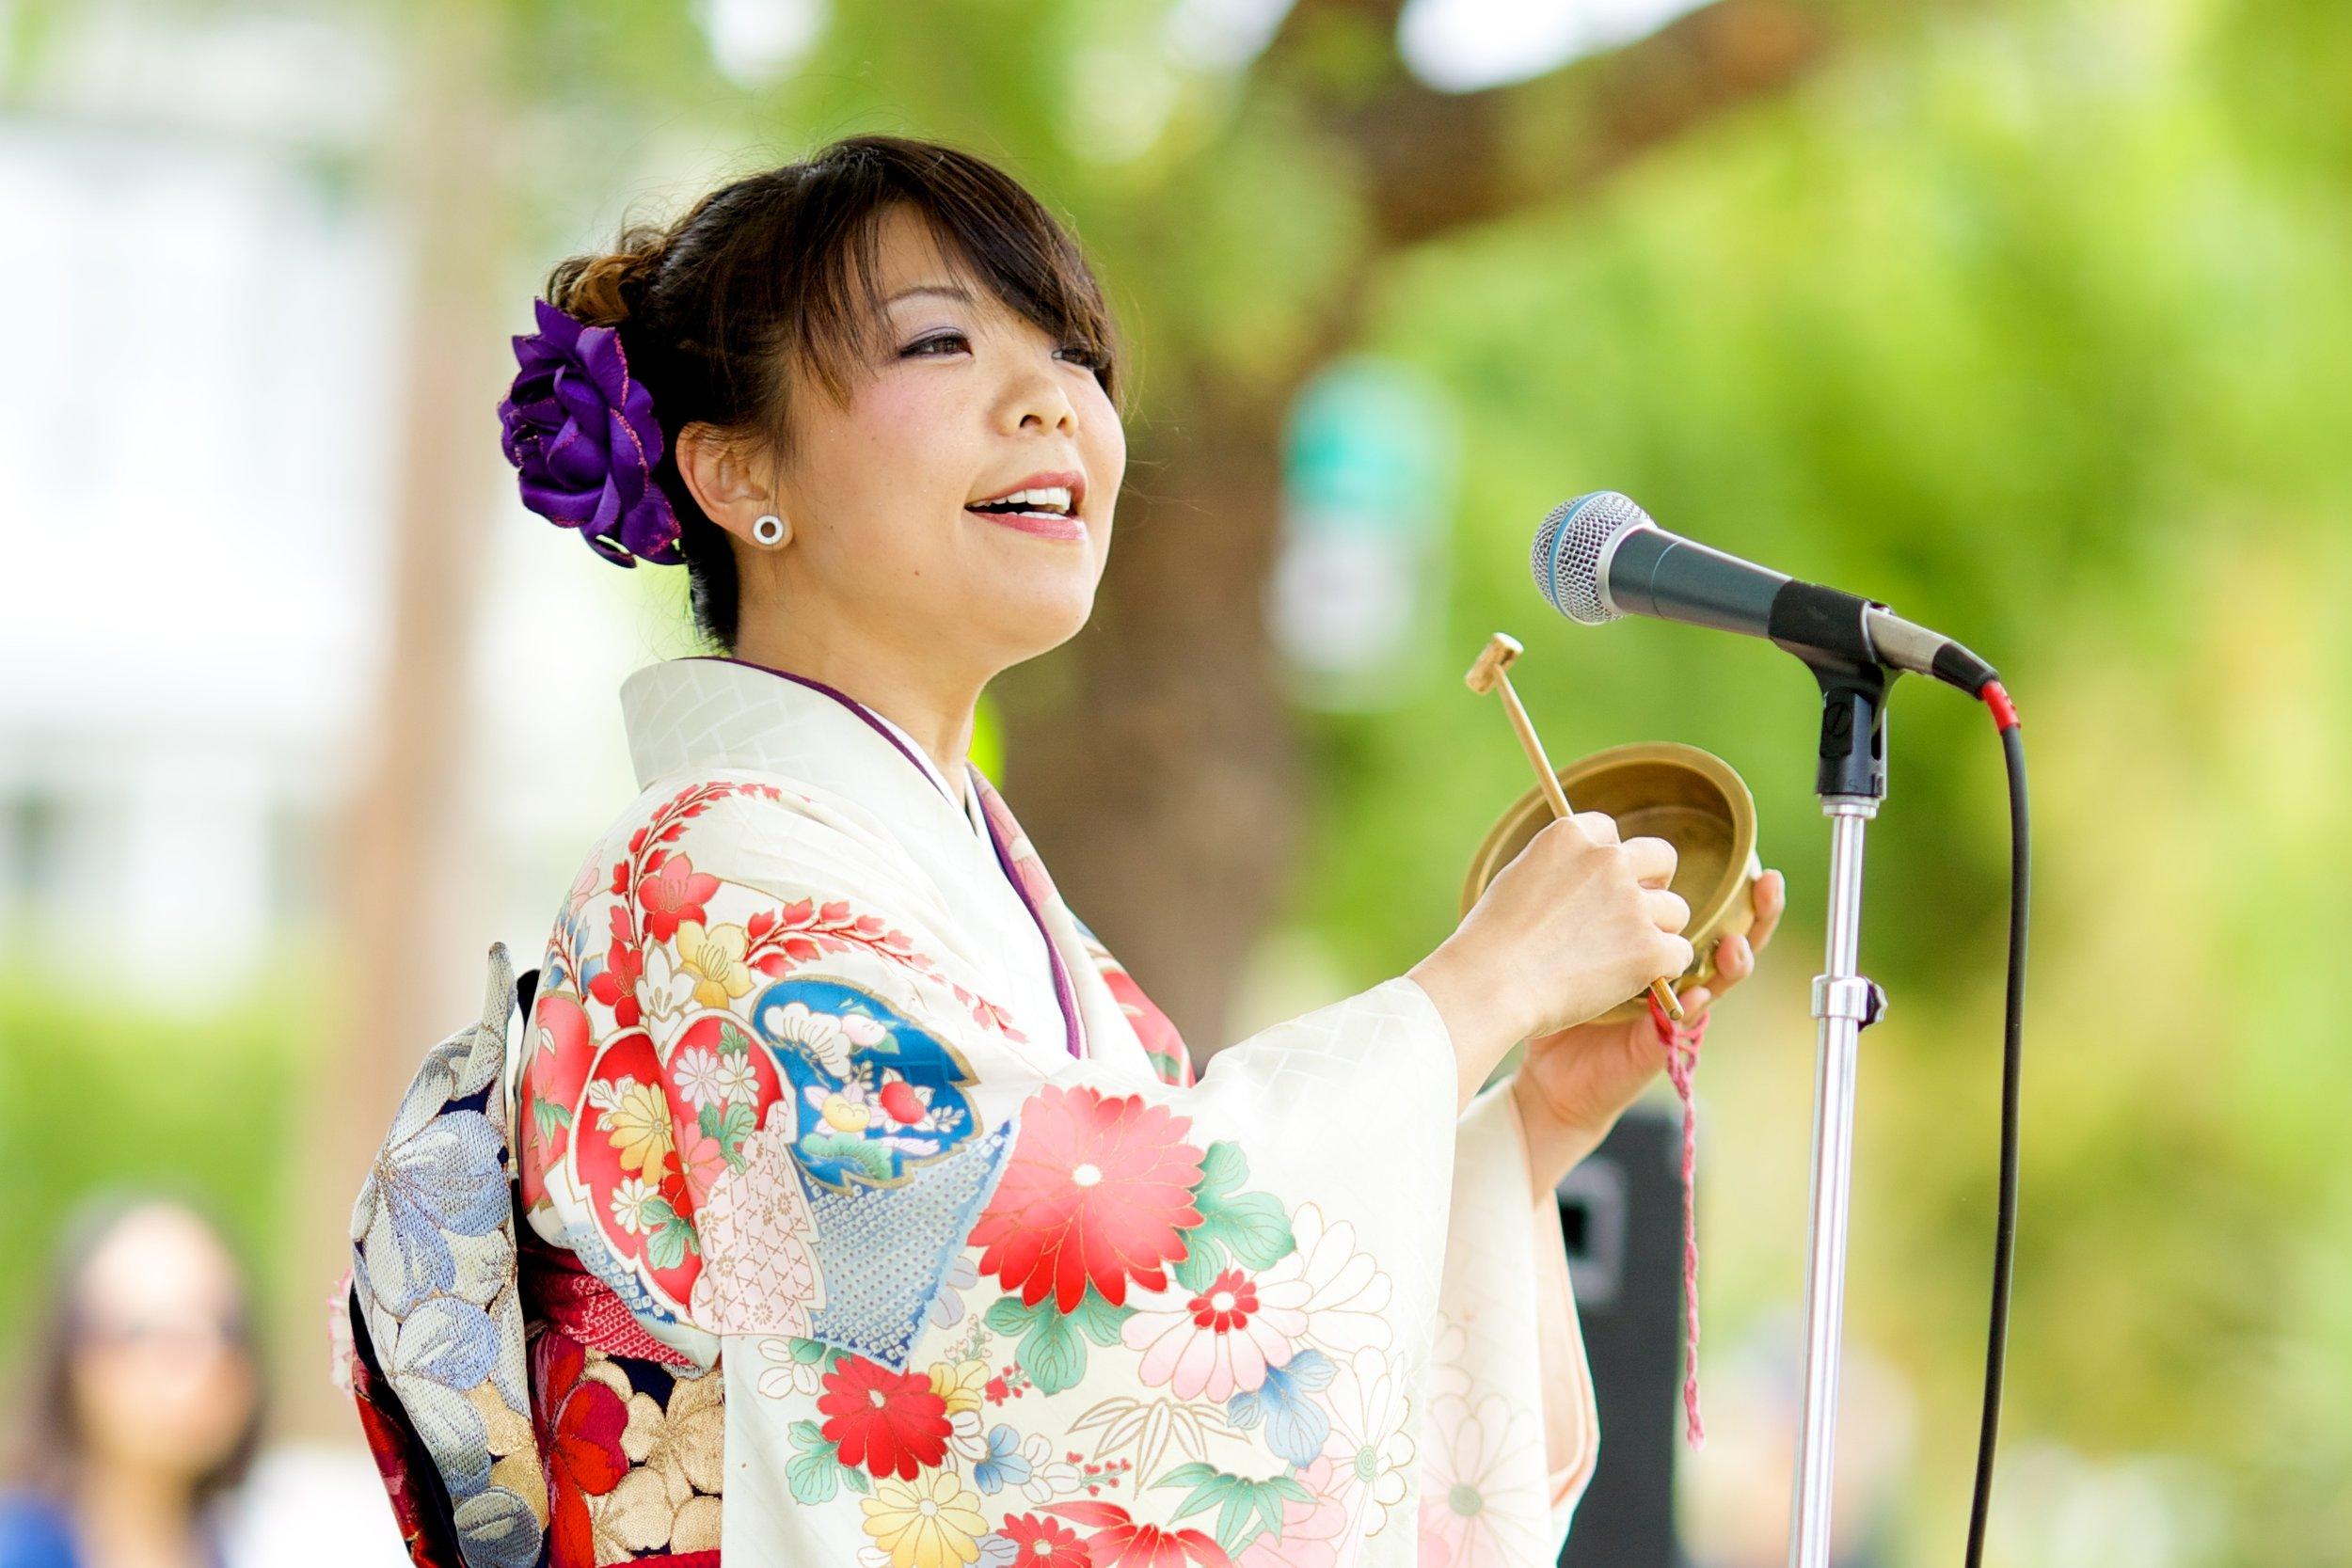 natsu-summer---matsutoyo-kai---japanese-cultural-fair-of-santa-cruz-2015_19589821042_o.jpg